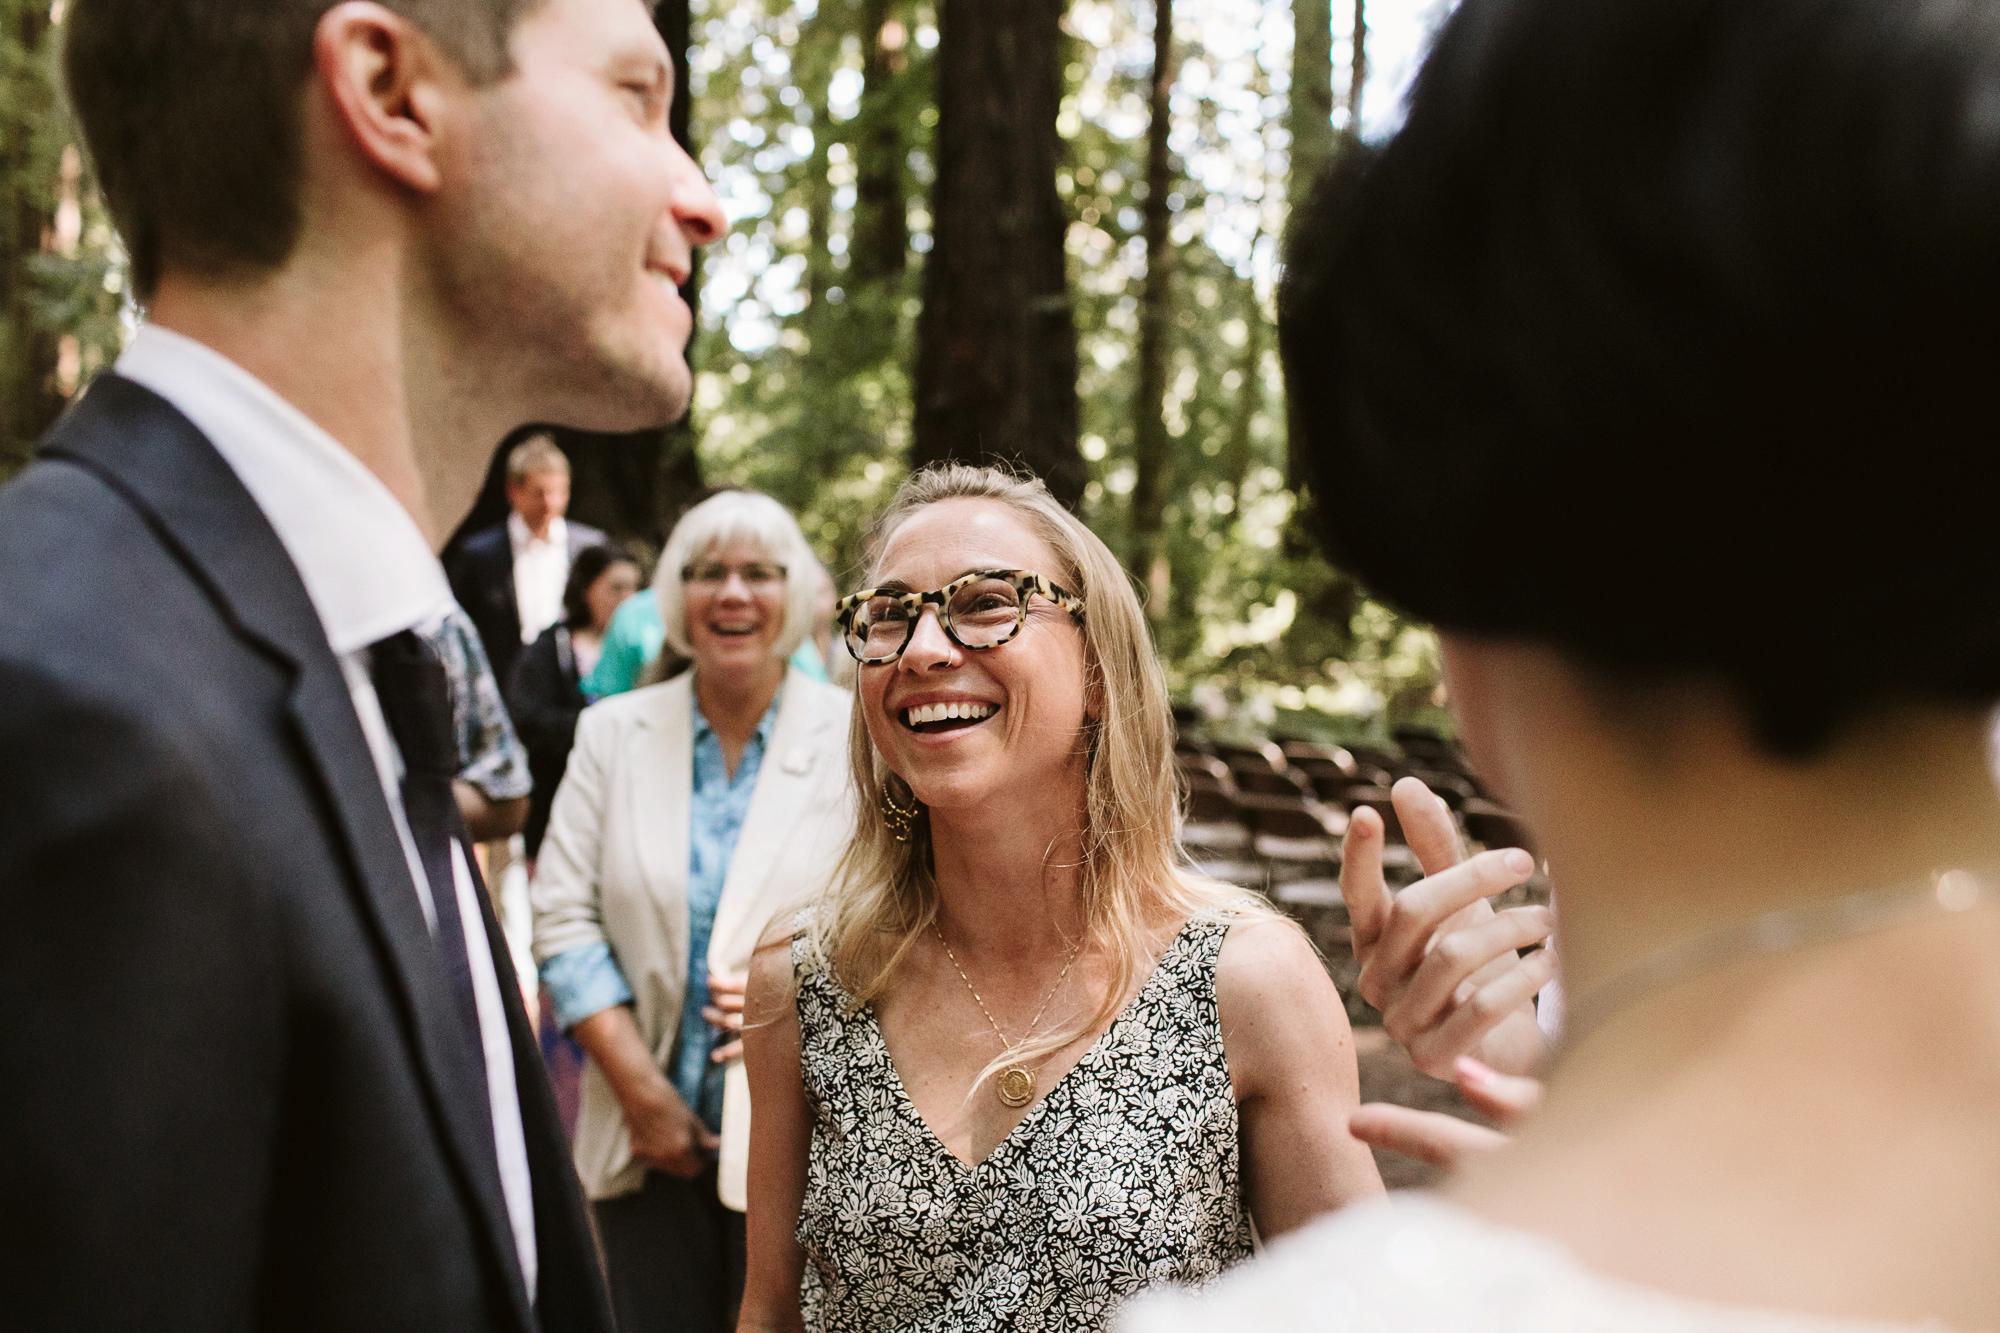 California-wedding-photographer-alfonso-flores-pamplin-groove-227.jpg